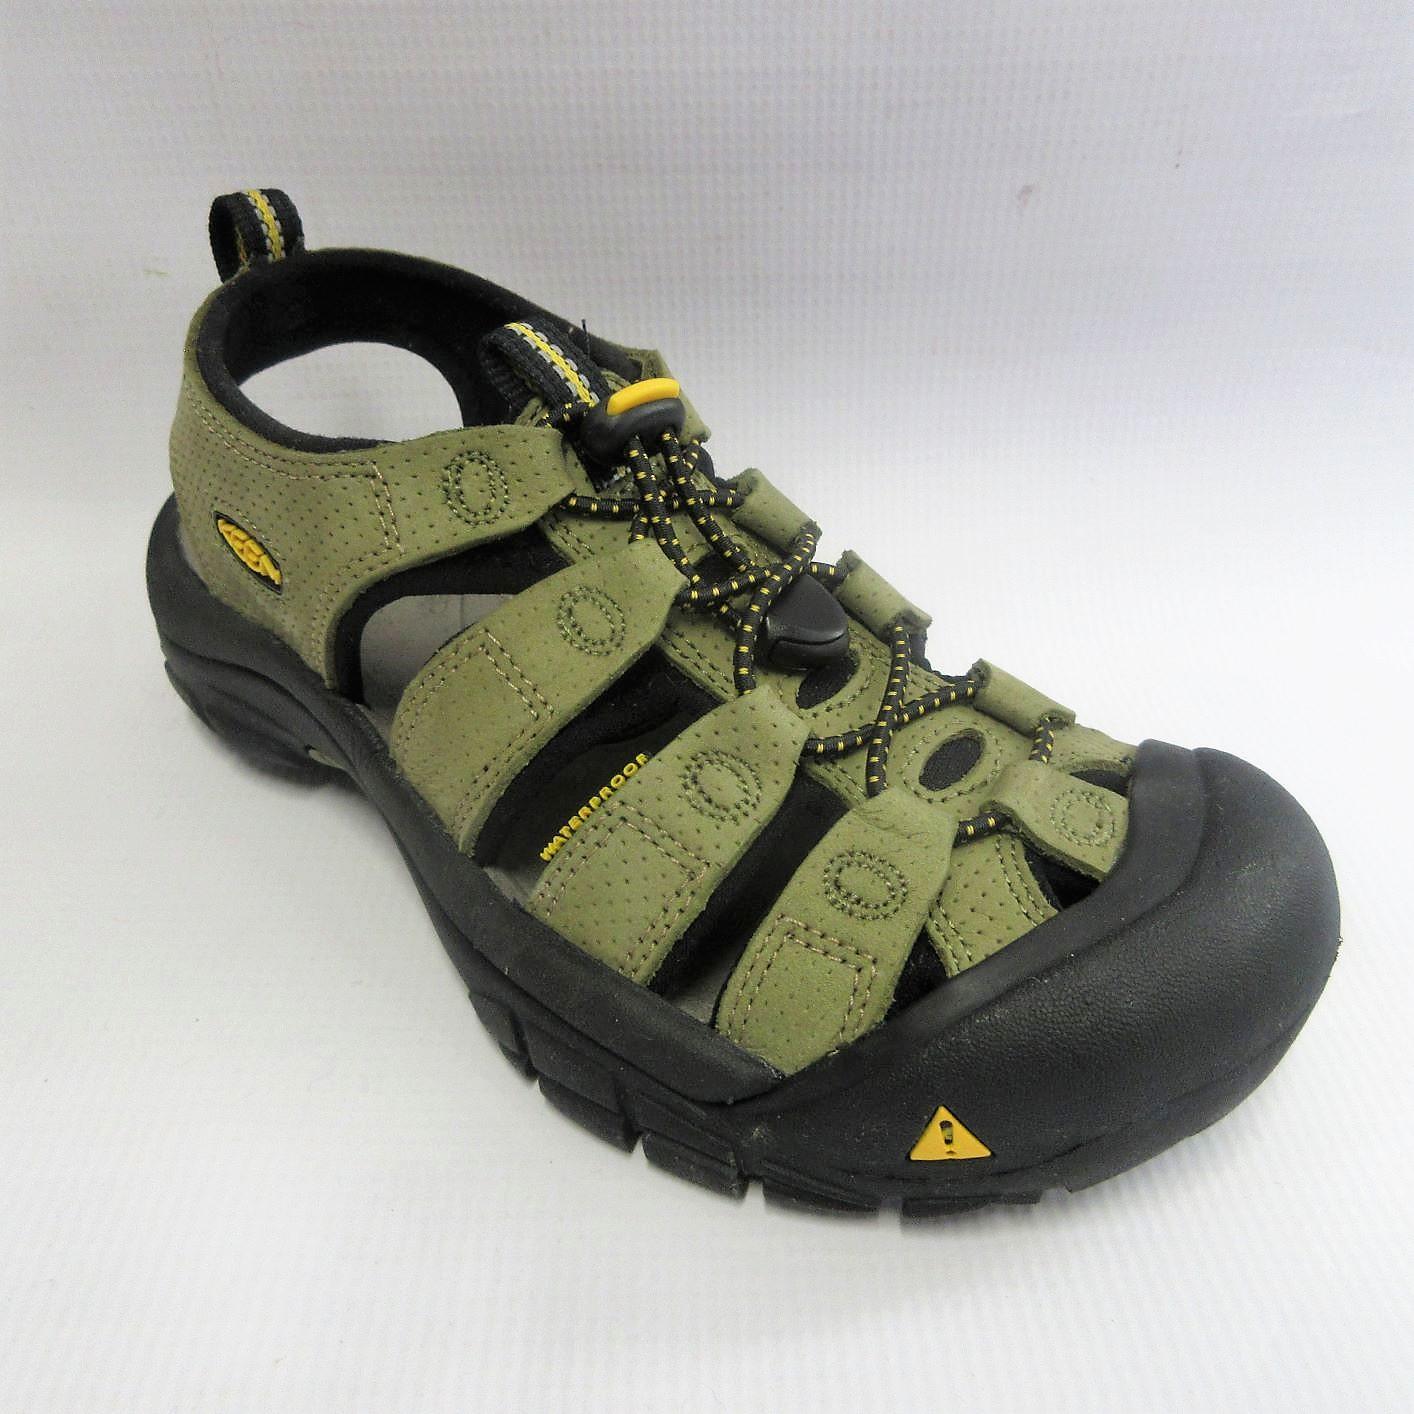 Keen Sandals Women Newport in Mint Size